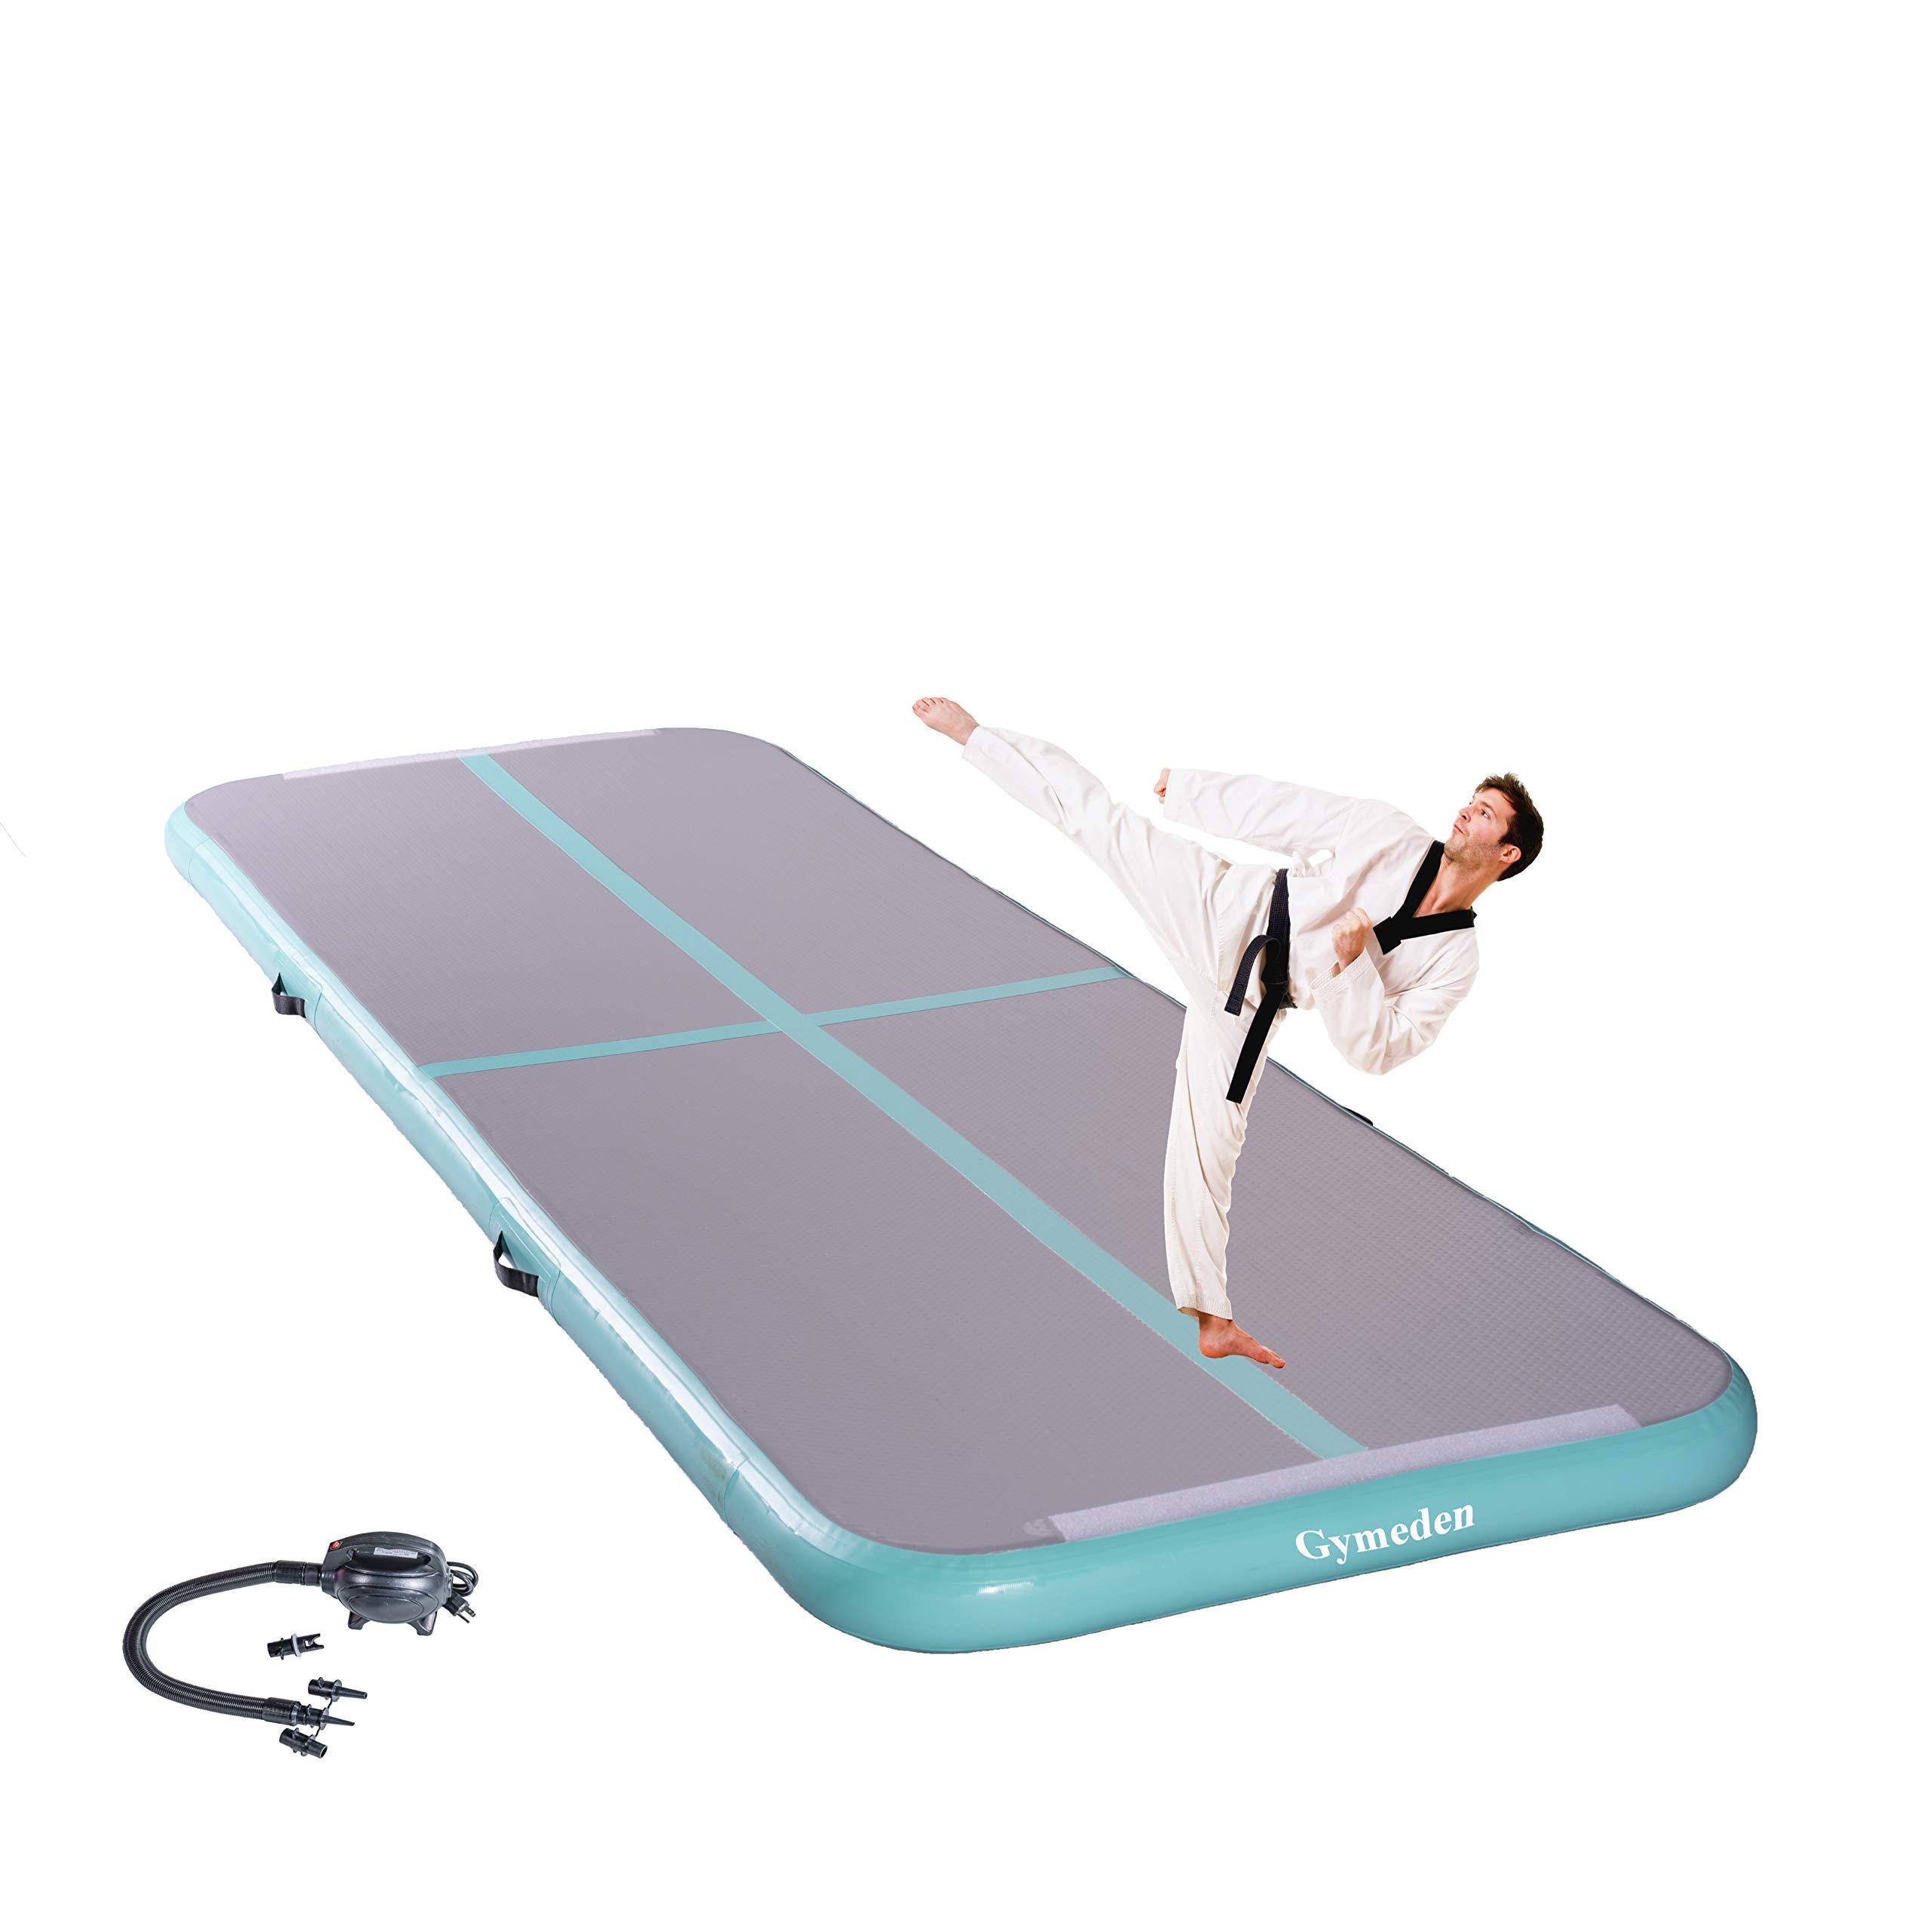 Gymeden Multi-Function extensible Airtrack Tumbling mat Kid Gymnastics mat Inflatable Gymnastics air Track air Tumble Track for Gymnastics Gym mats for Kids Taekwondo Dancing,Parkour,Yoga,Tumbling